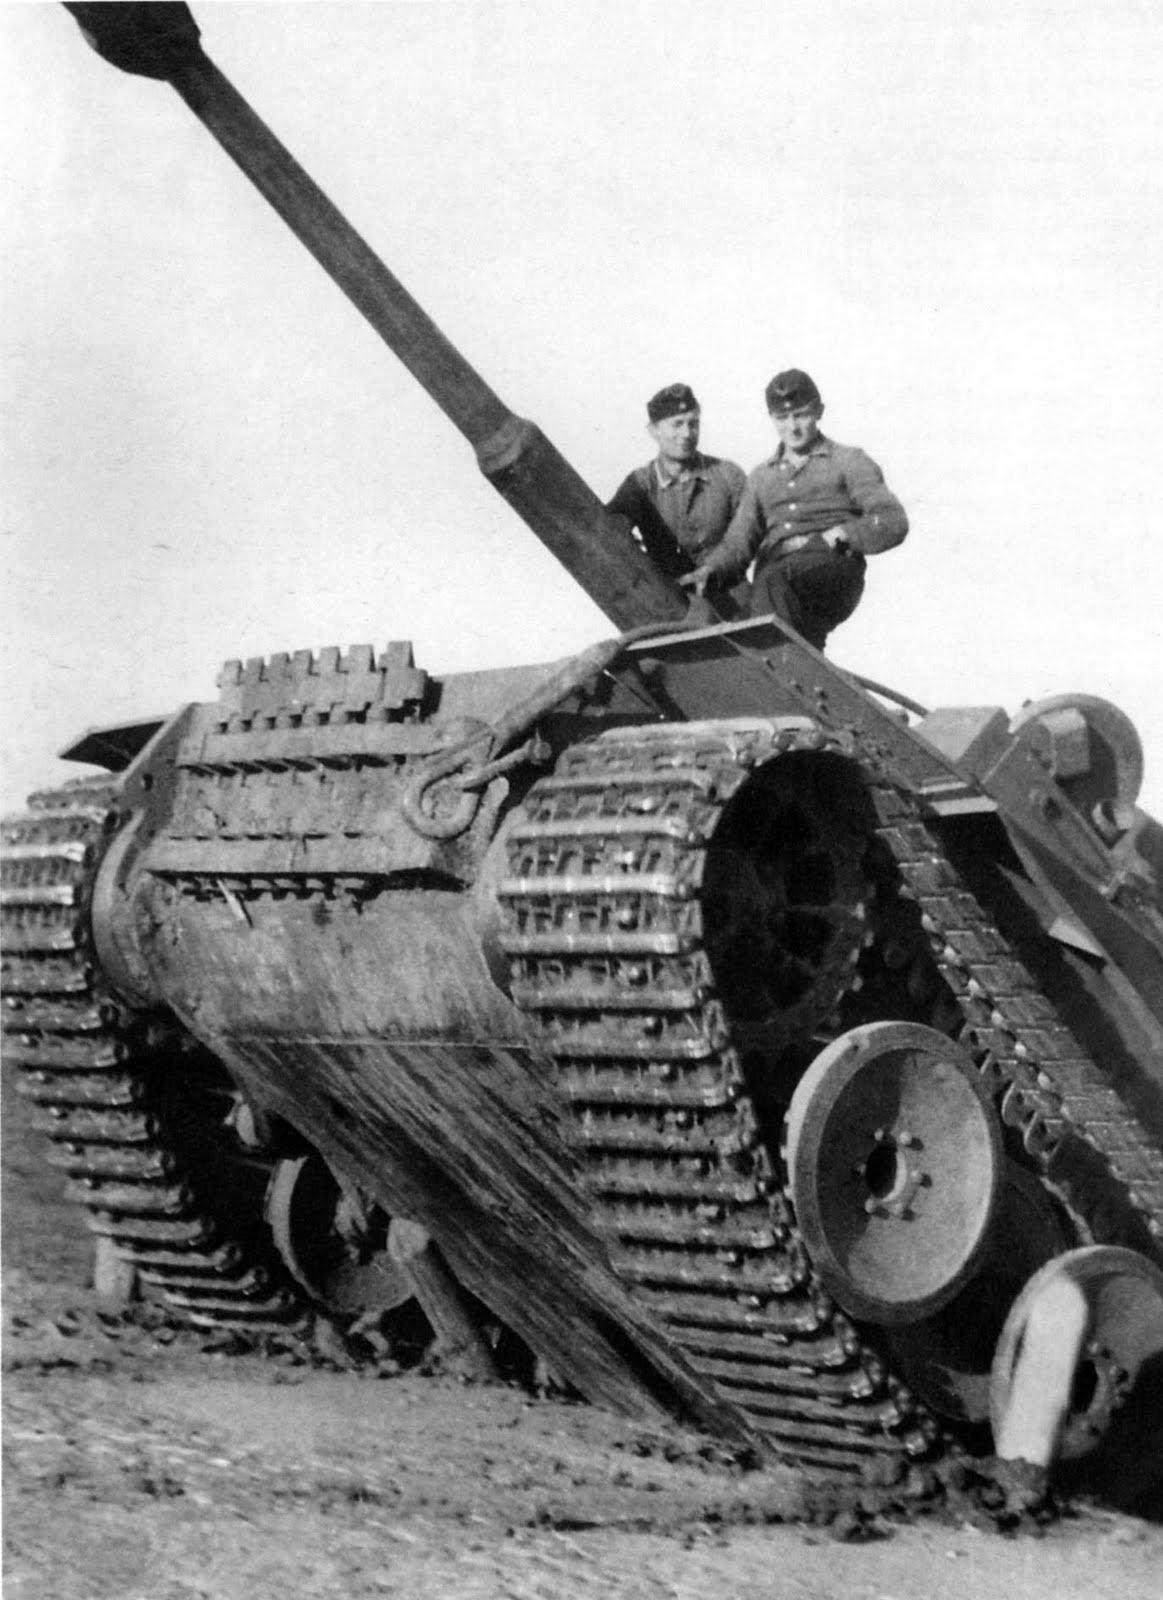 Pz C Puertas Exterior: 1000+ Images About World War II